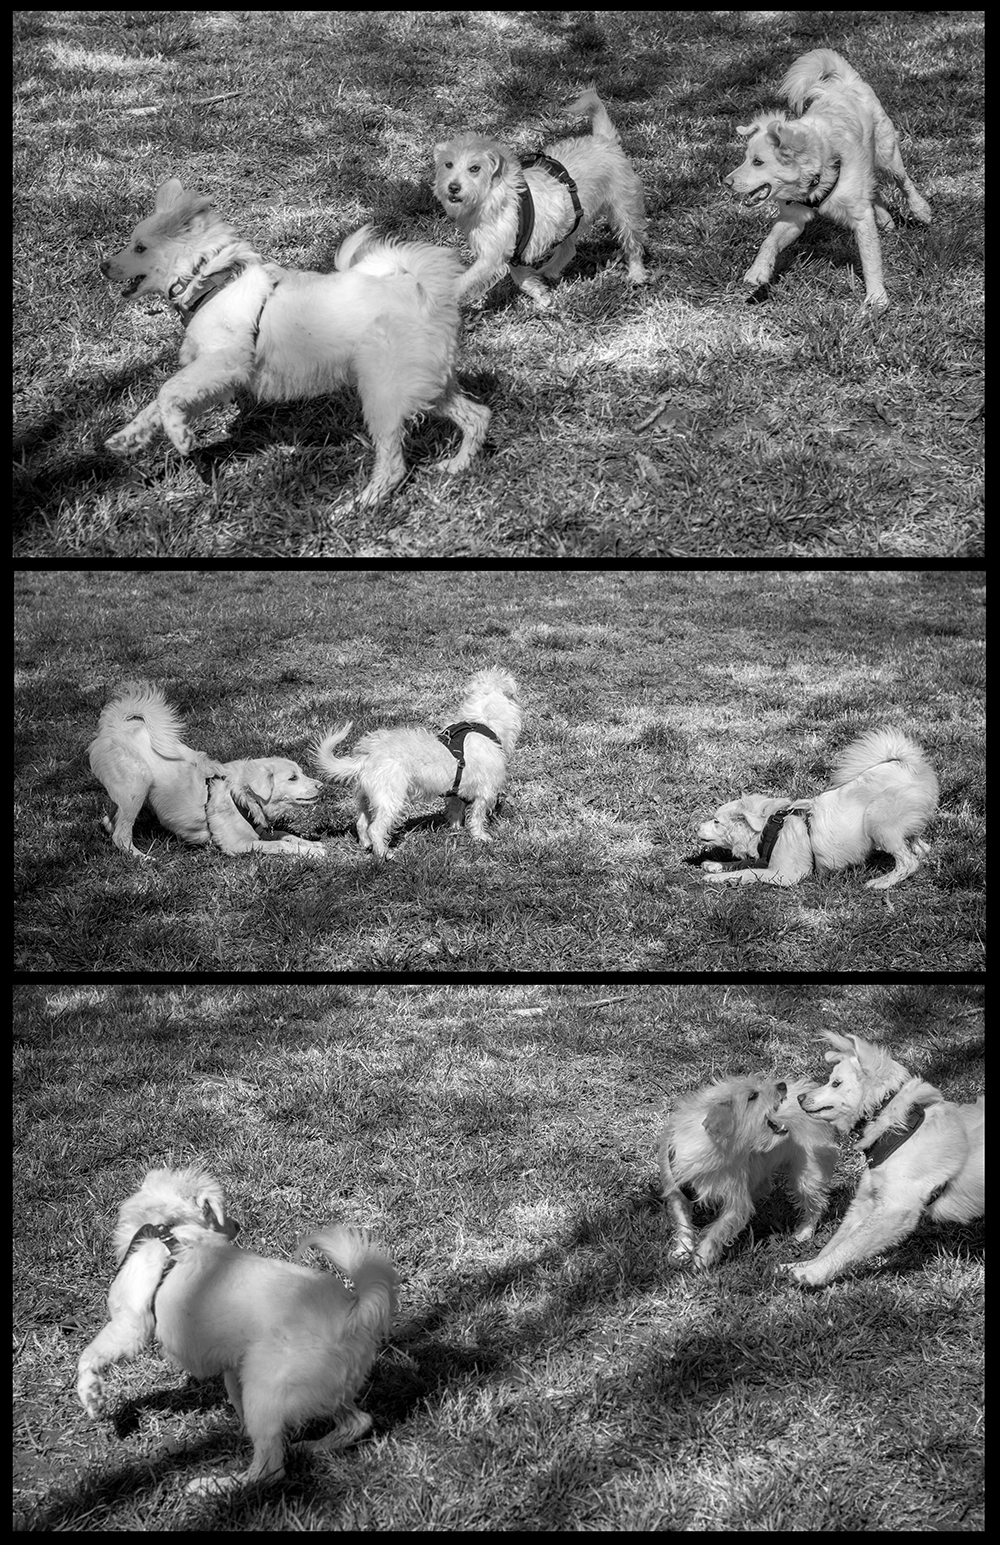 walk, talk, play, chase